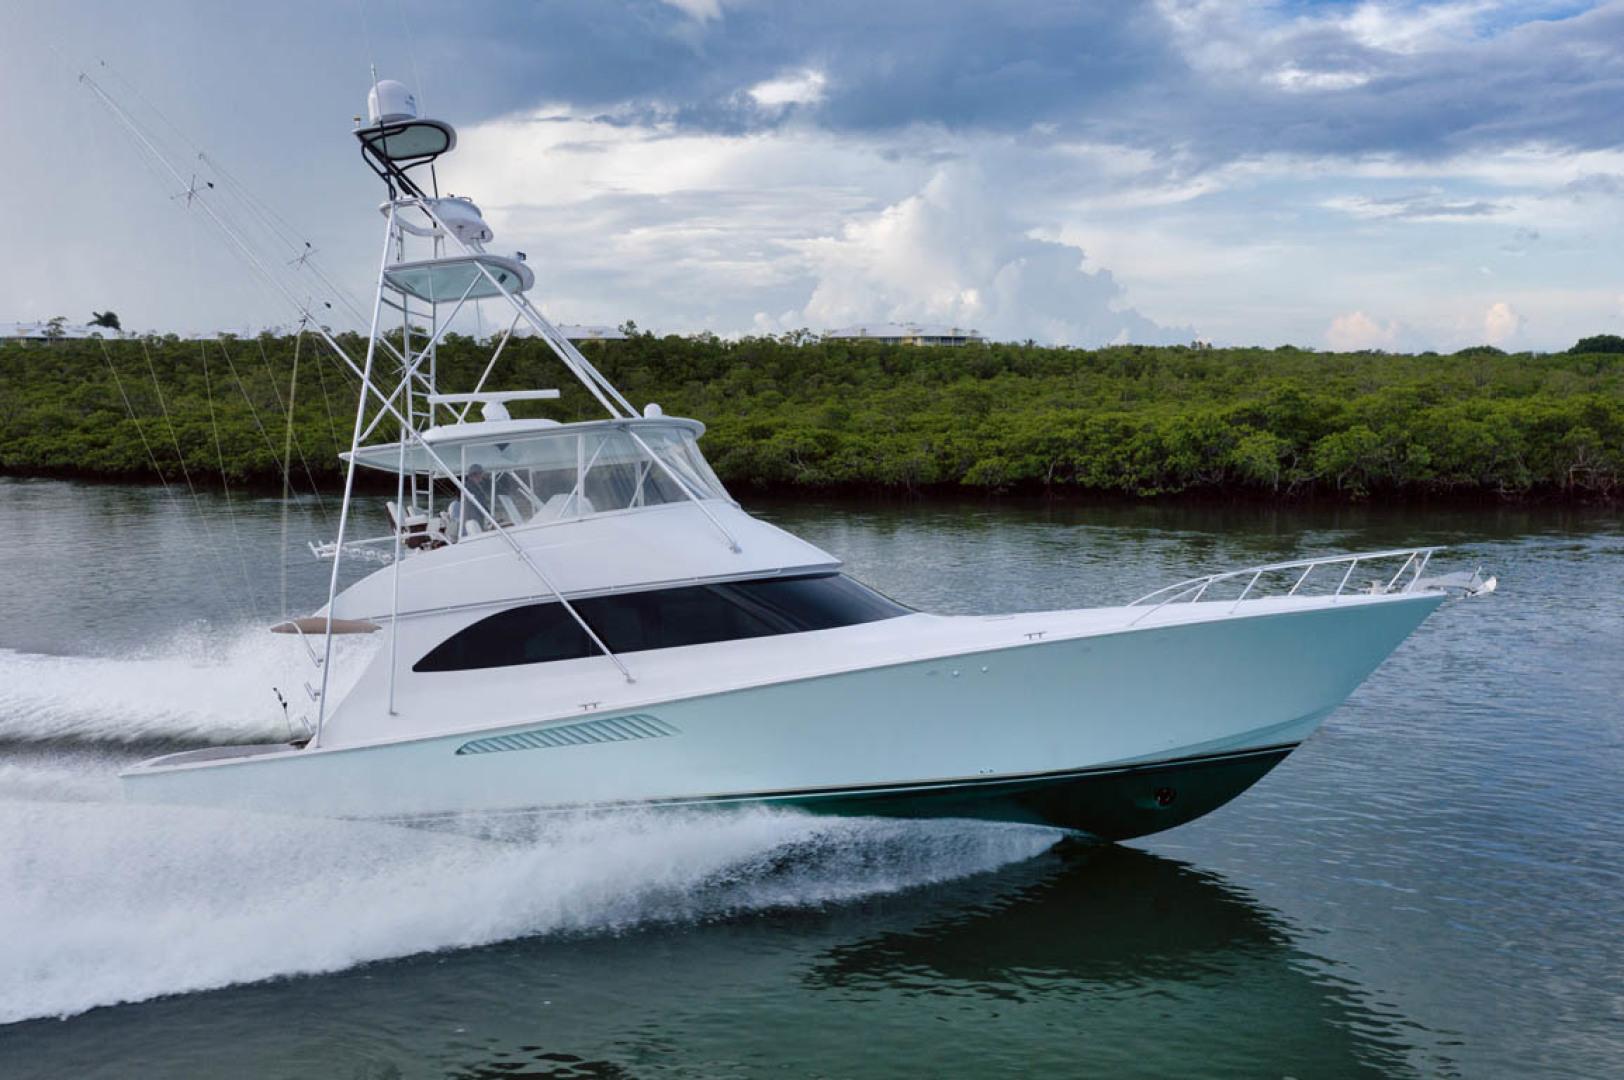 Viking-Convertible 2009-MOLLIE K Key Largo-Florida-United States-Starboard View-1487438 | Thumbnail